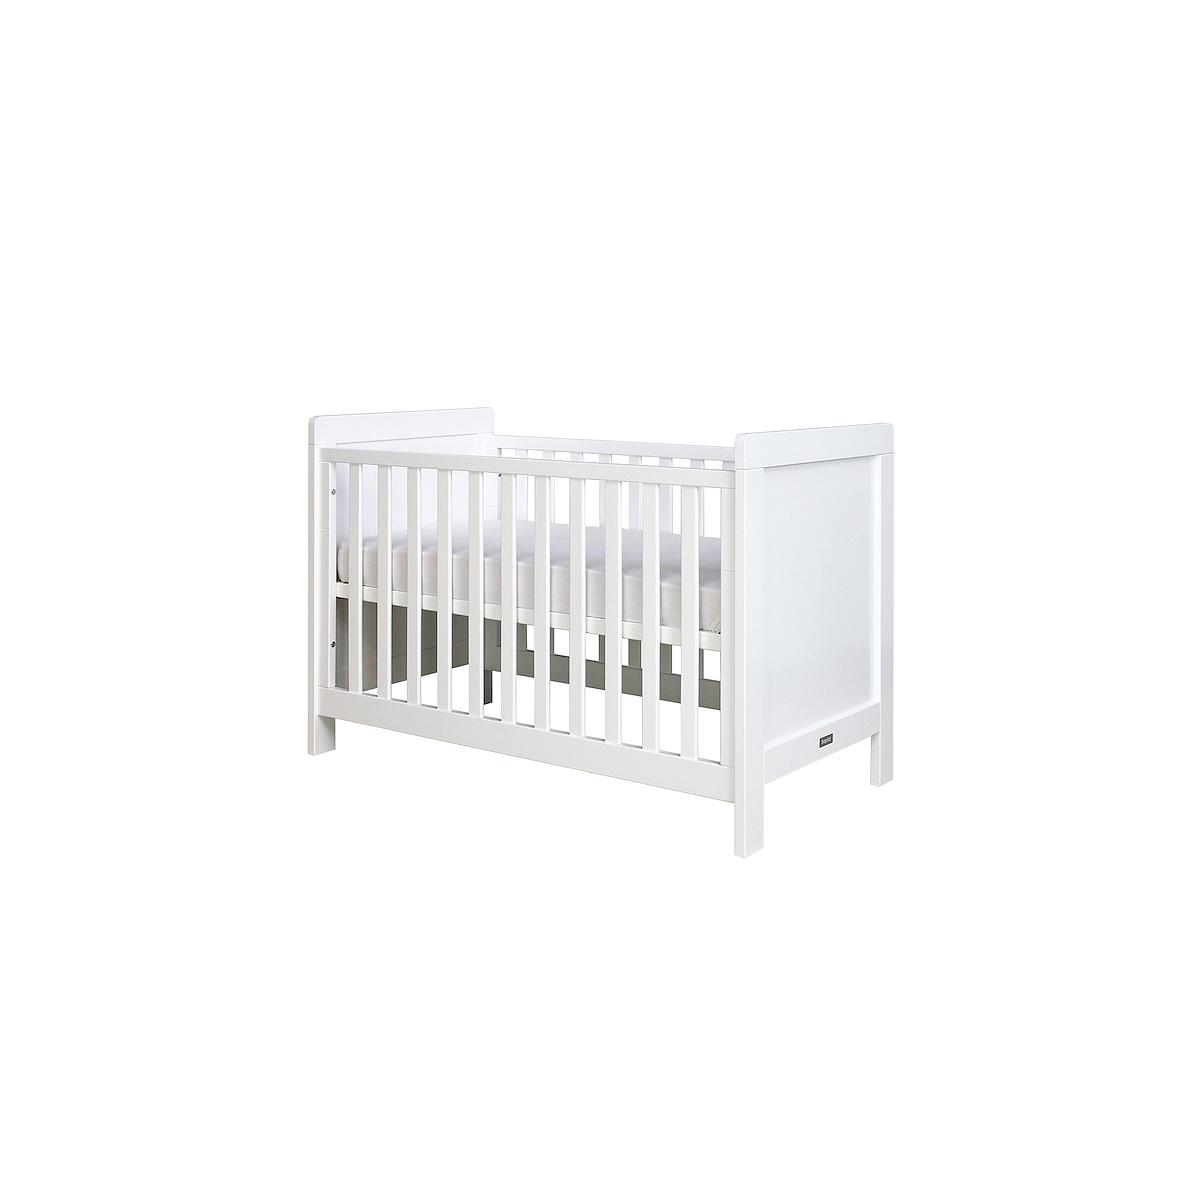 Lit bébé 60x120 cm SVEN Bopita blanc